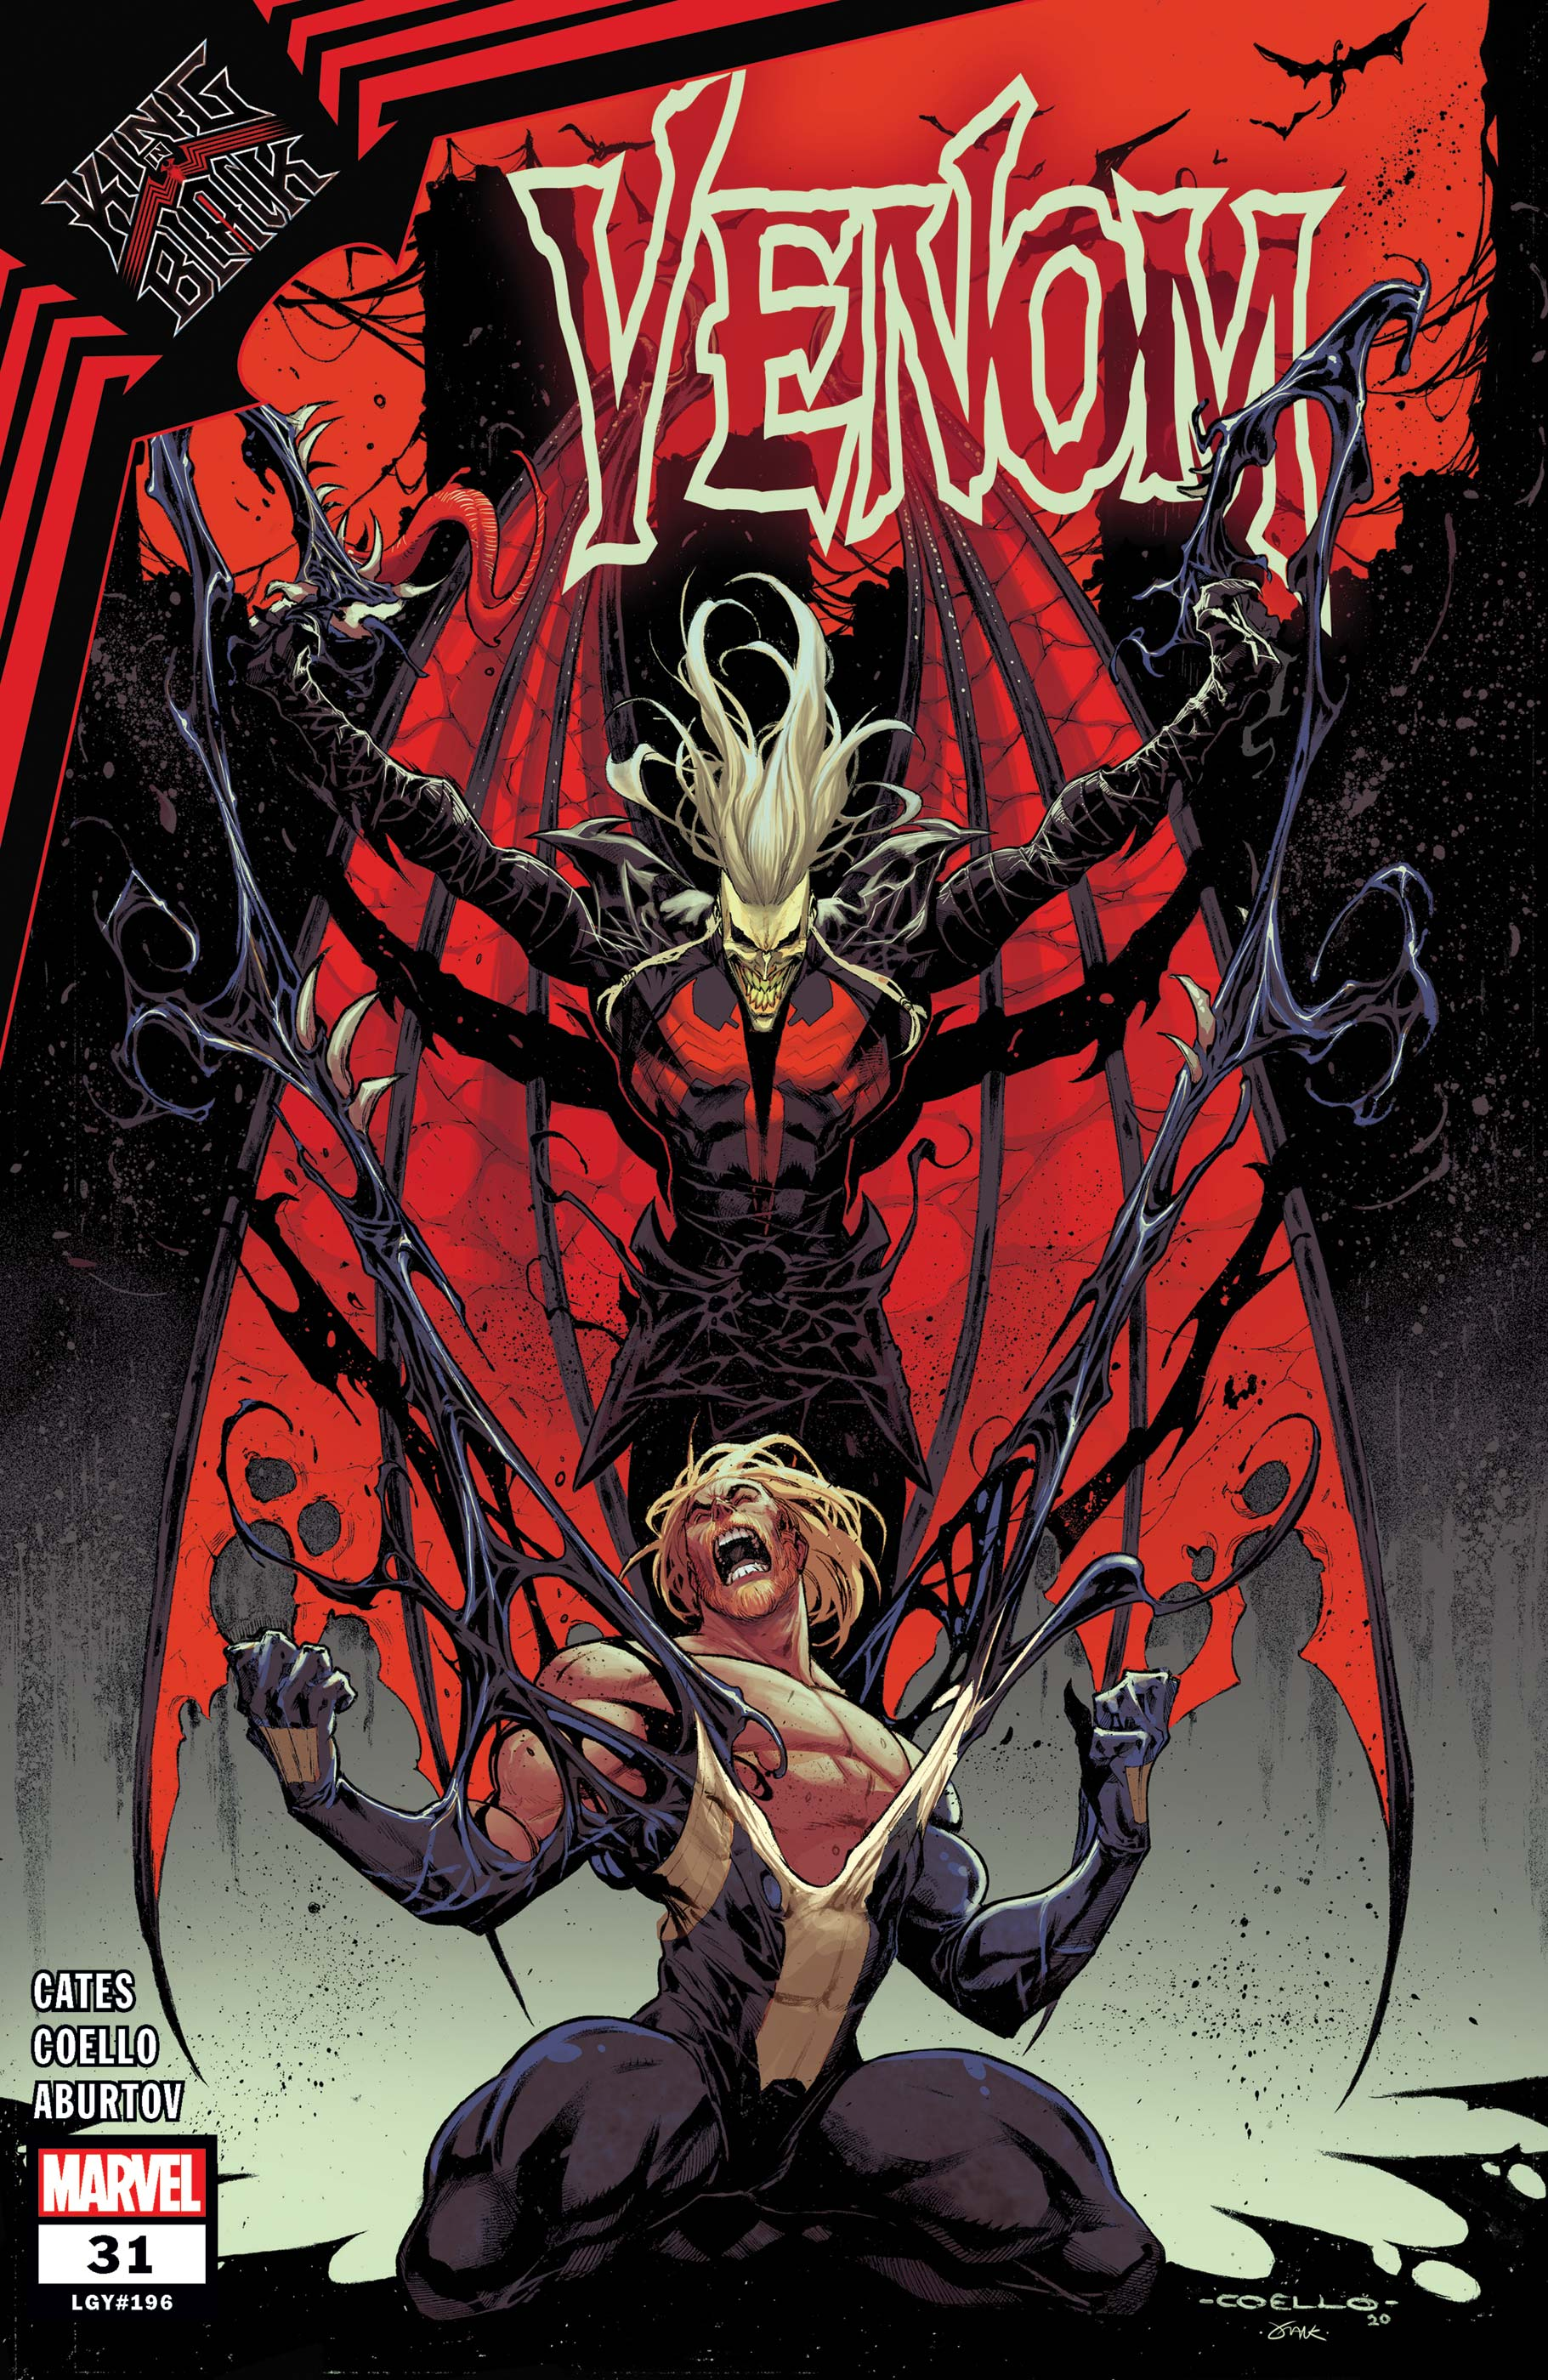 Venom (2018) #31